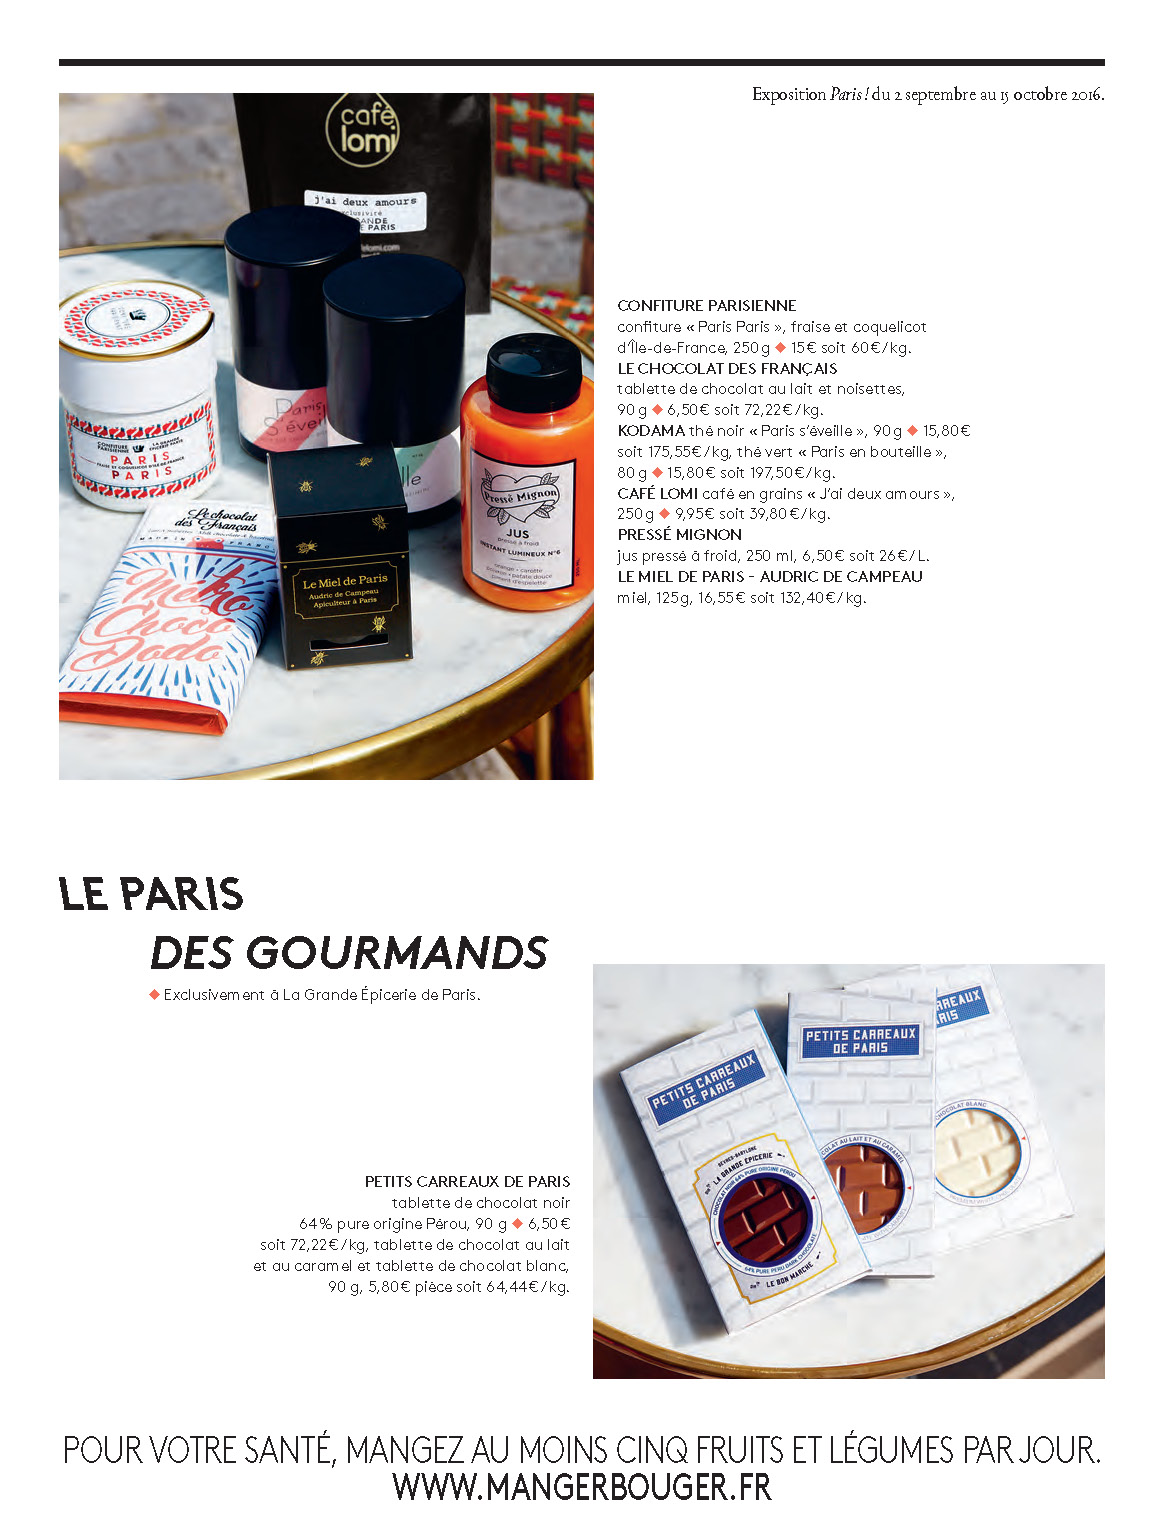 bm-esprit-paris-ah16_Page_016.jpg